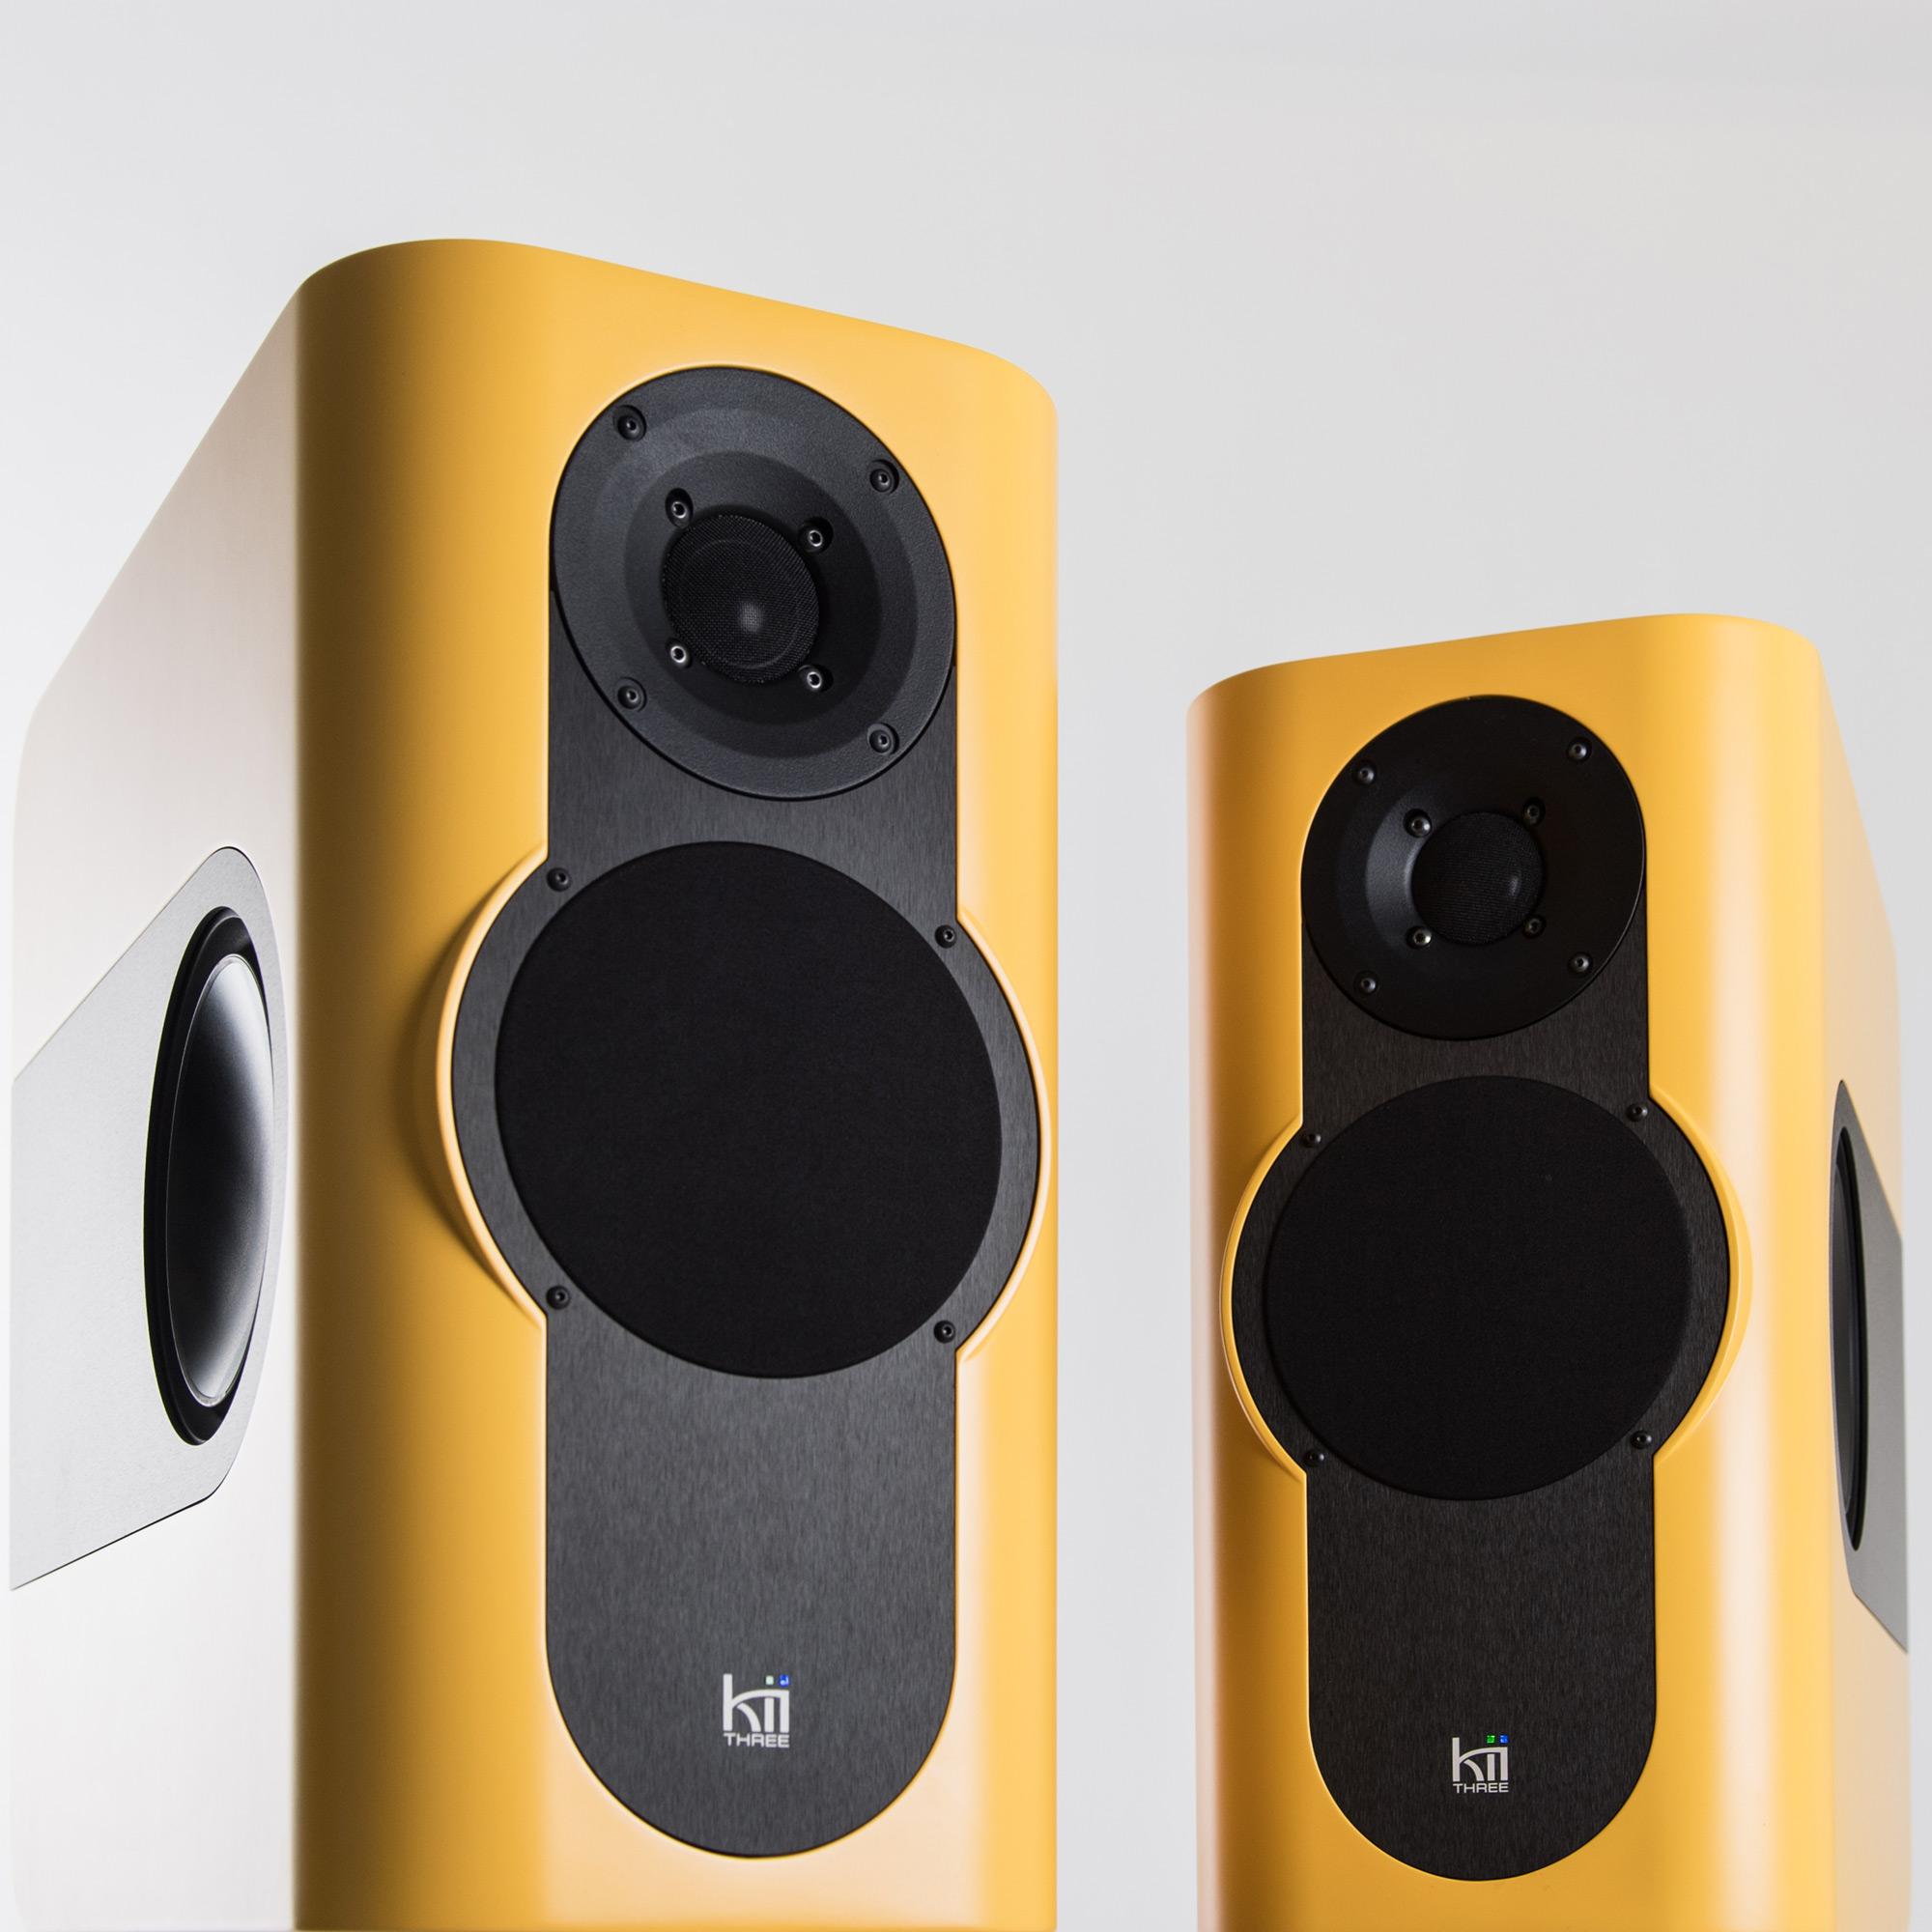 kii-audio-gallery-1.jpg